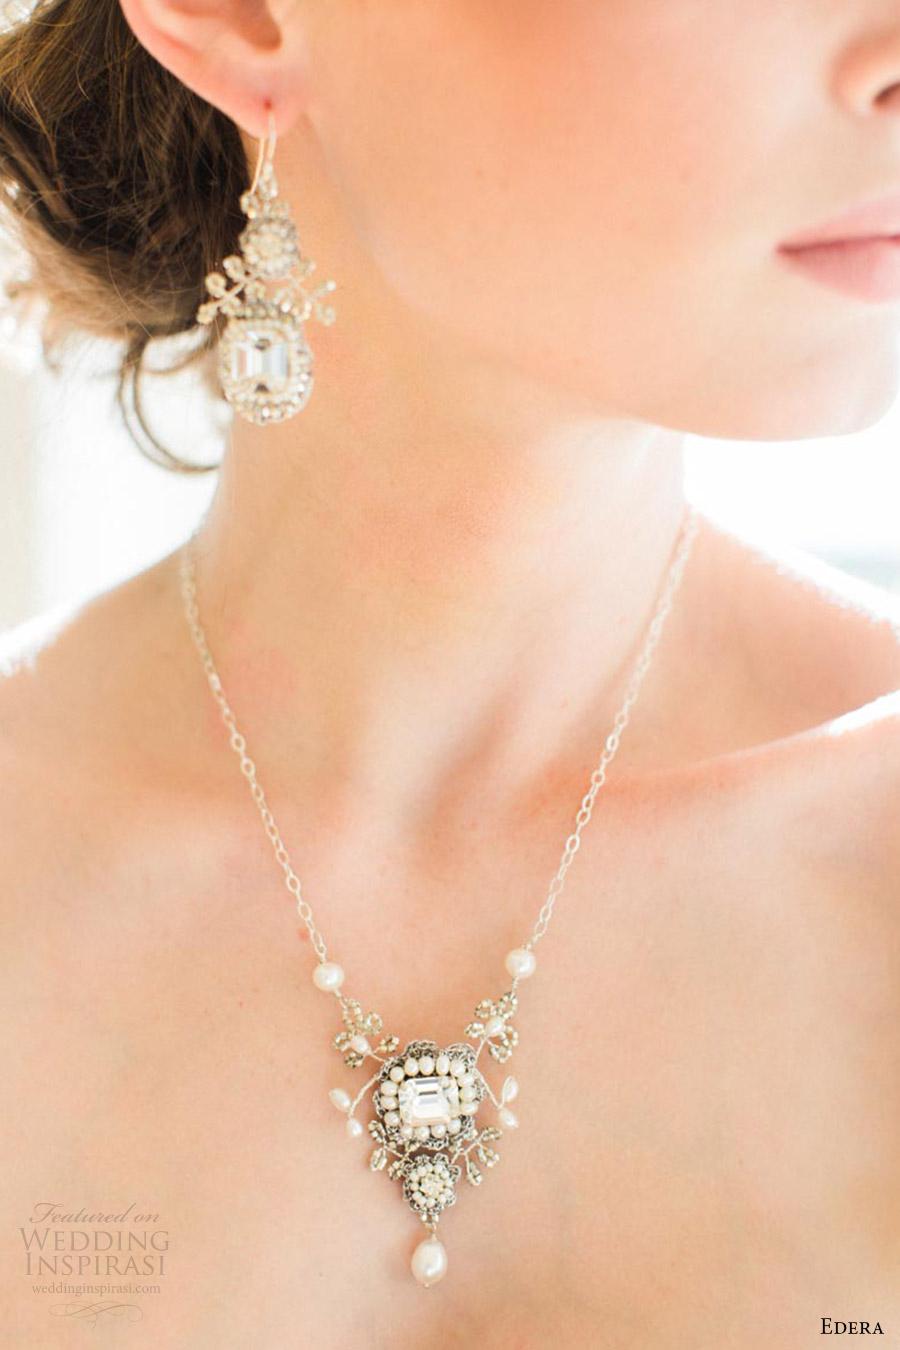 edera jewelry 2016 bridal accessories collection (victorine) lace wedding bib necklace